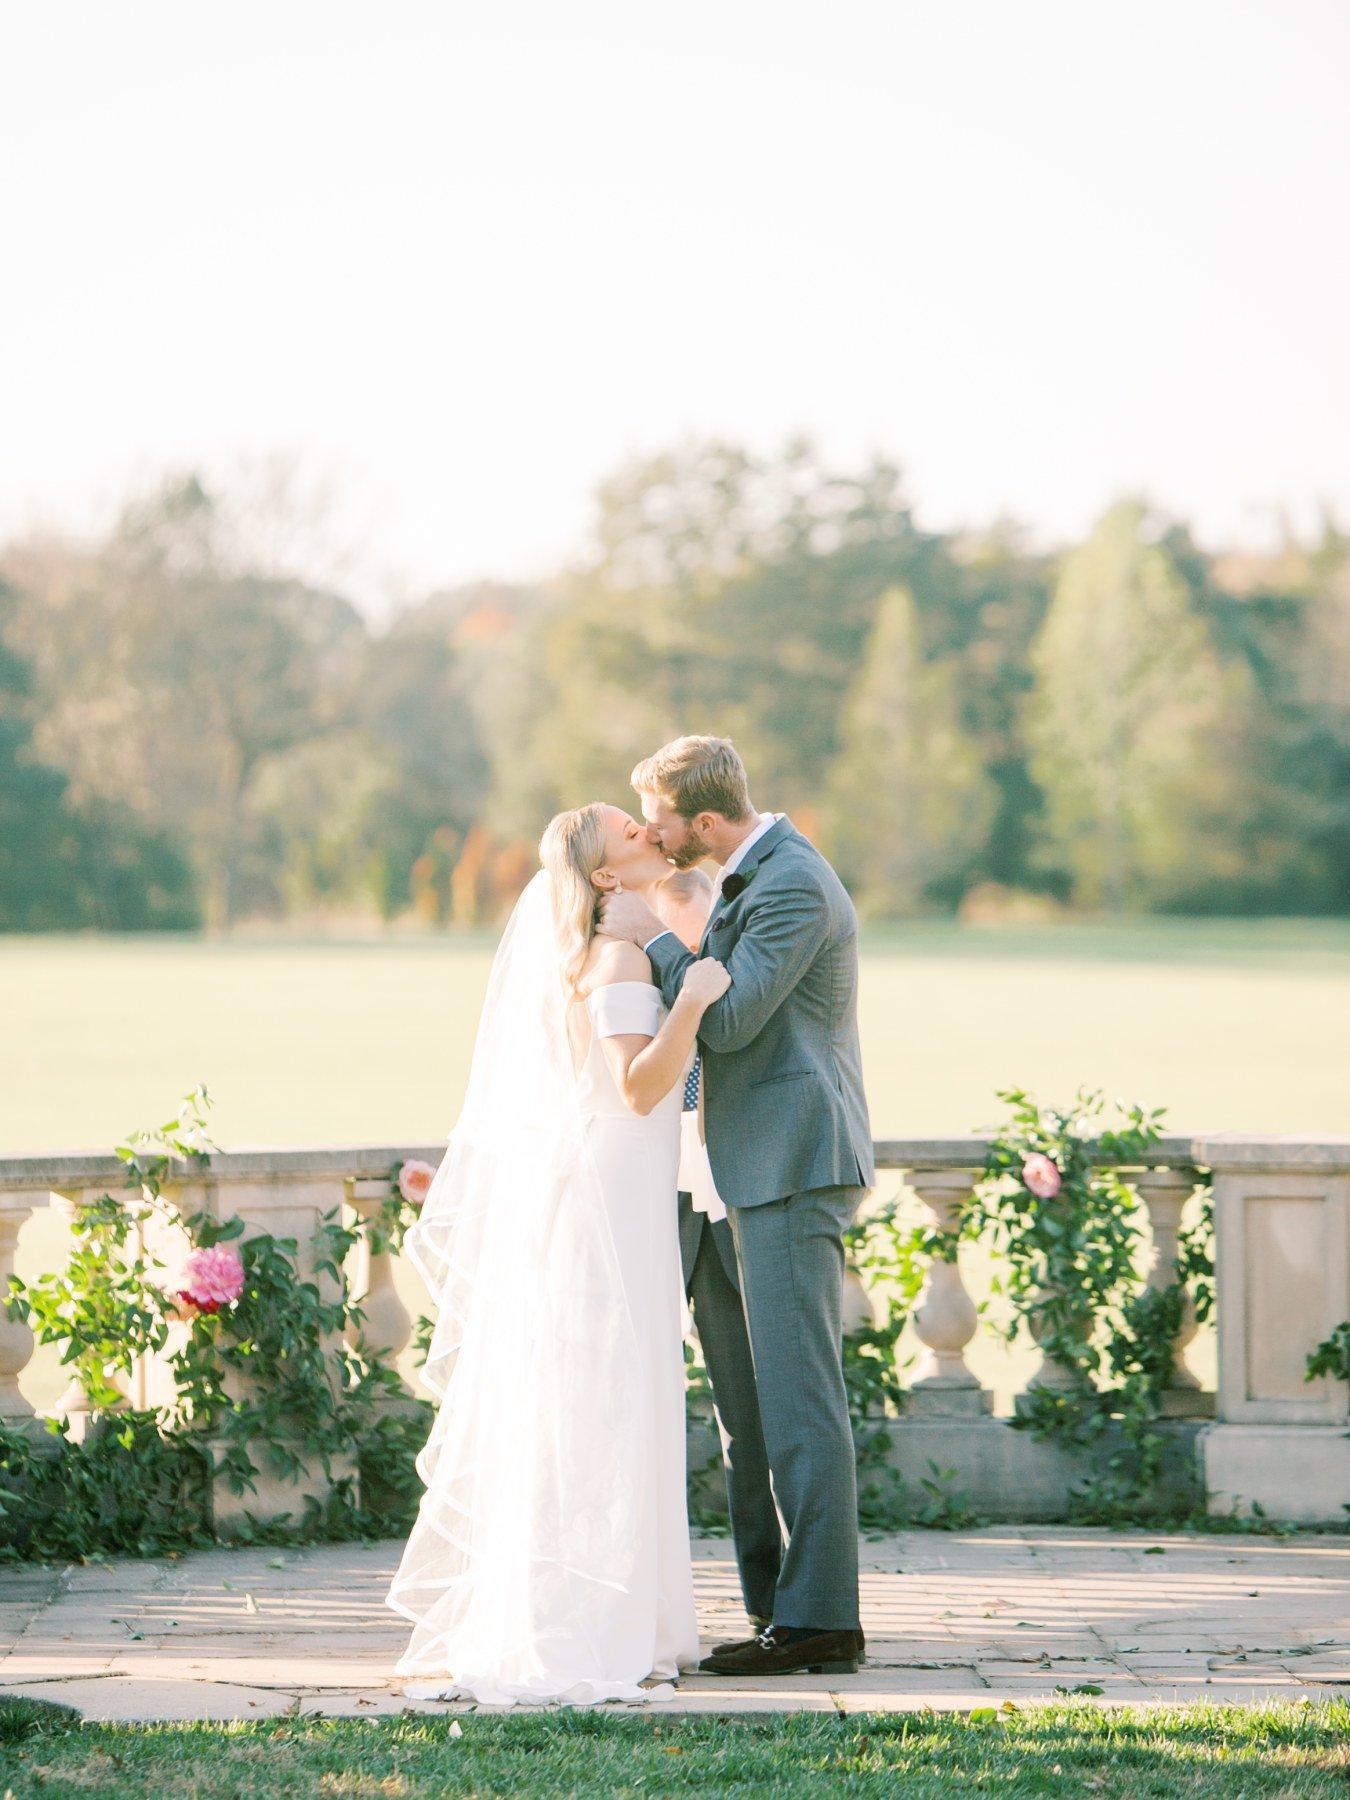 30Great_Marsh_Estates_Wedding_Anne_Kelley_Events_Astrid_PhotographyAP_02282